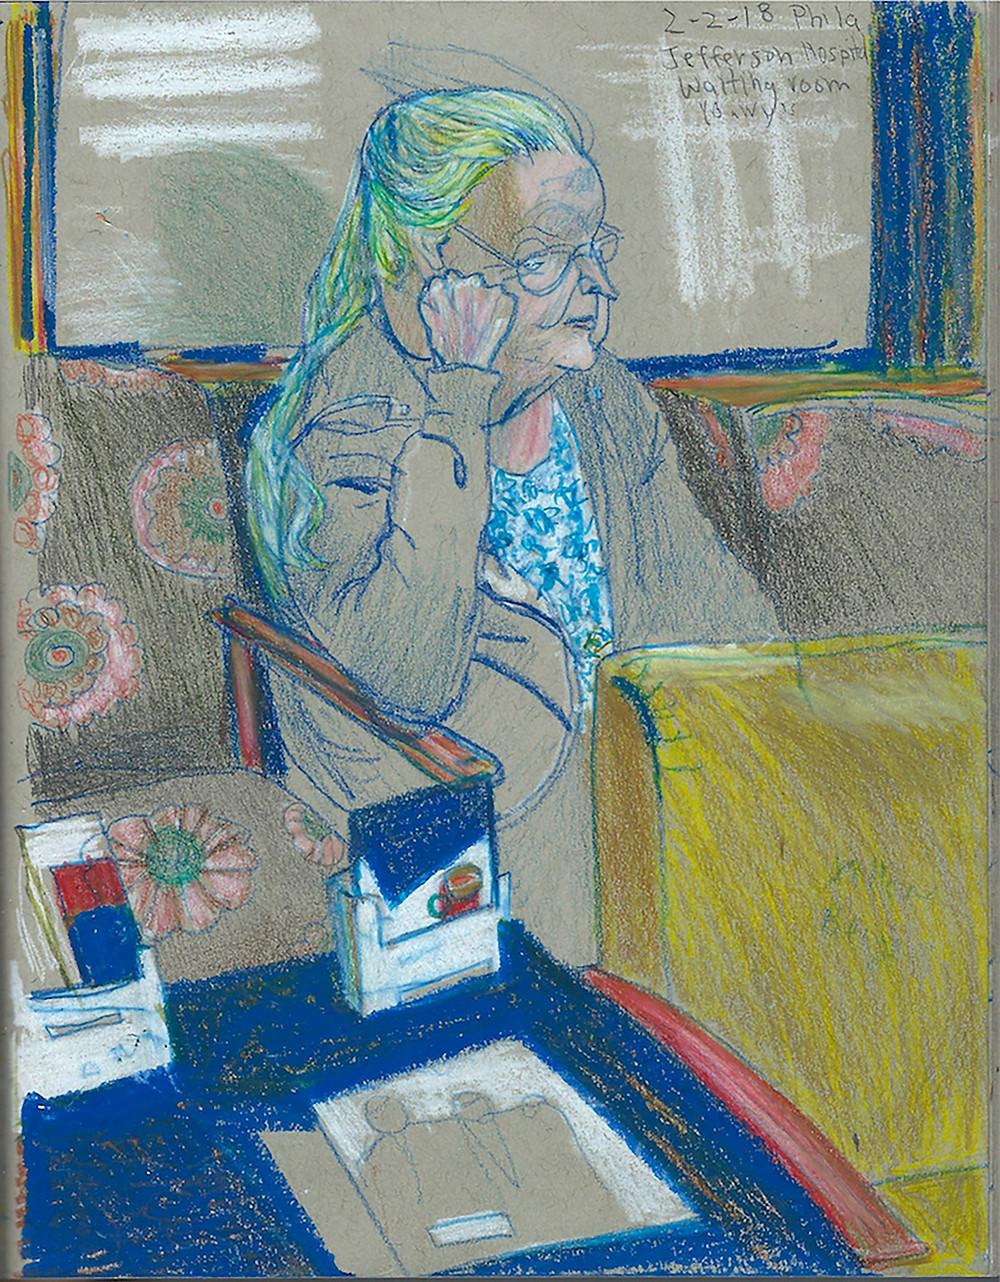 Waiting Room by Ellen Abraham